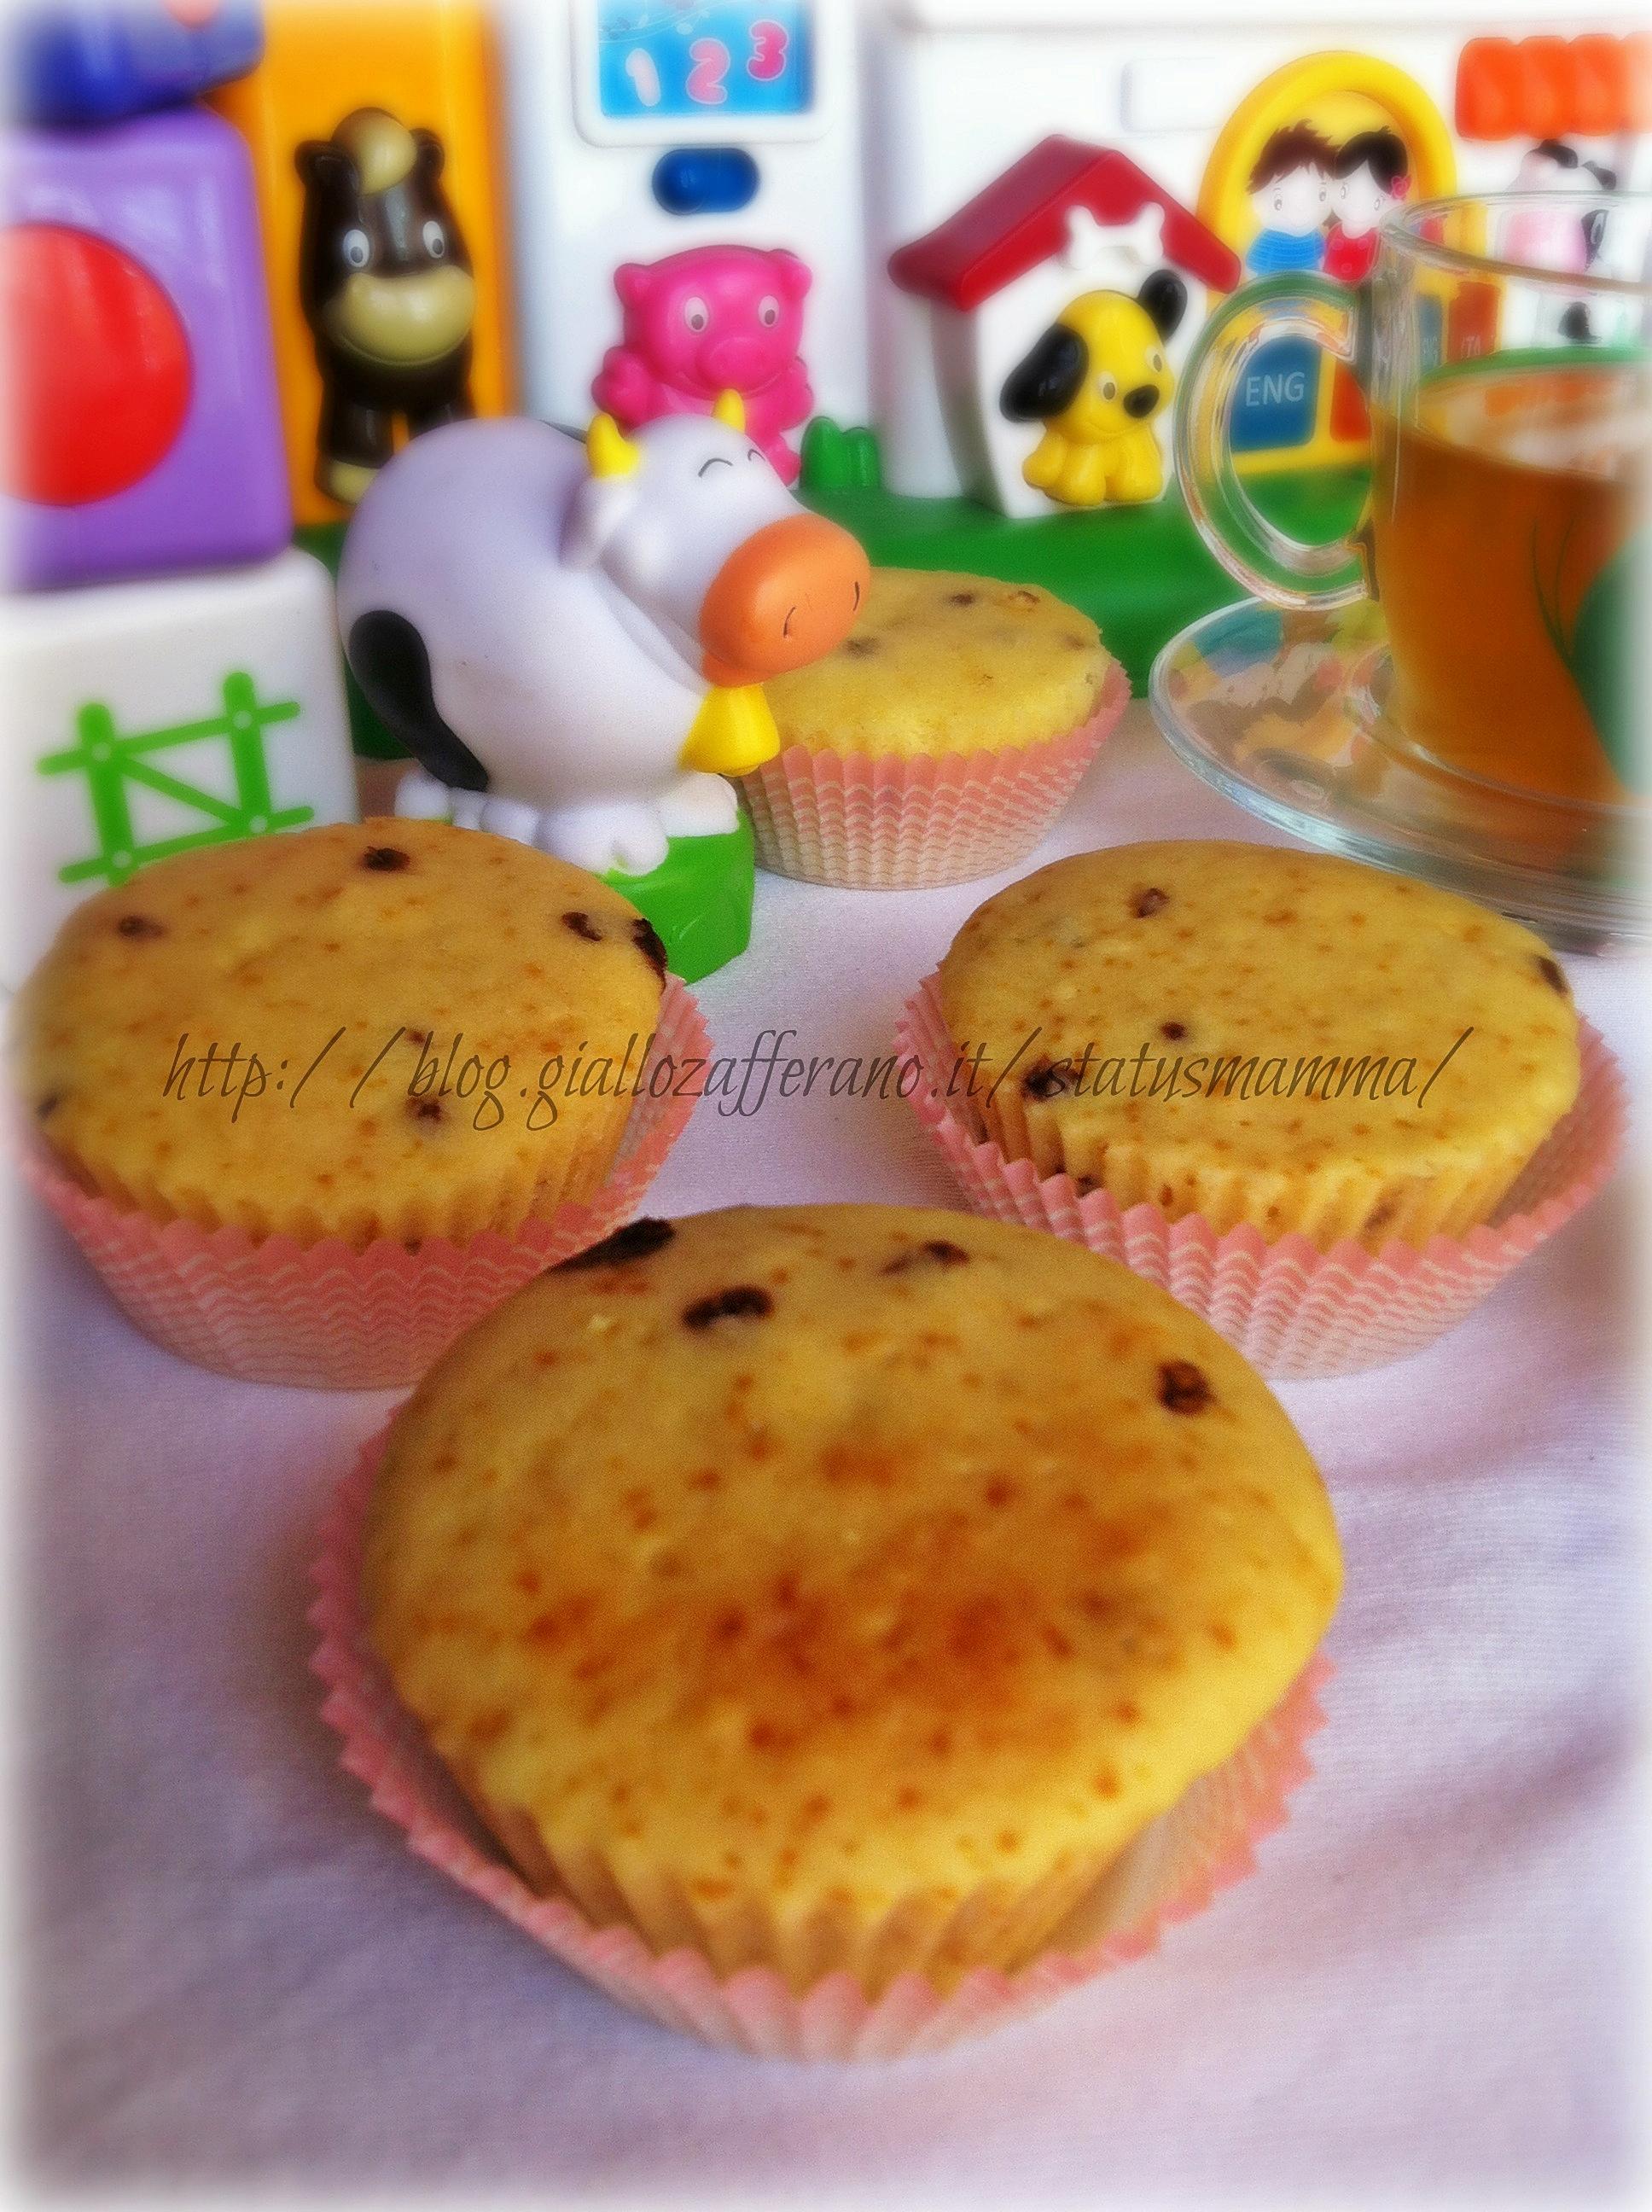 Tortini al cioccolato cottura vapore ricetta status mamma vporiera microonde dolci bimbi merenda